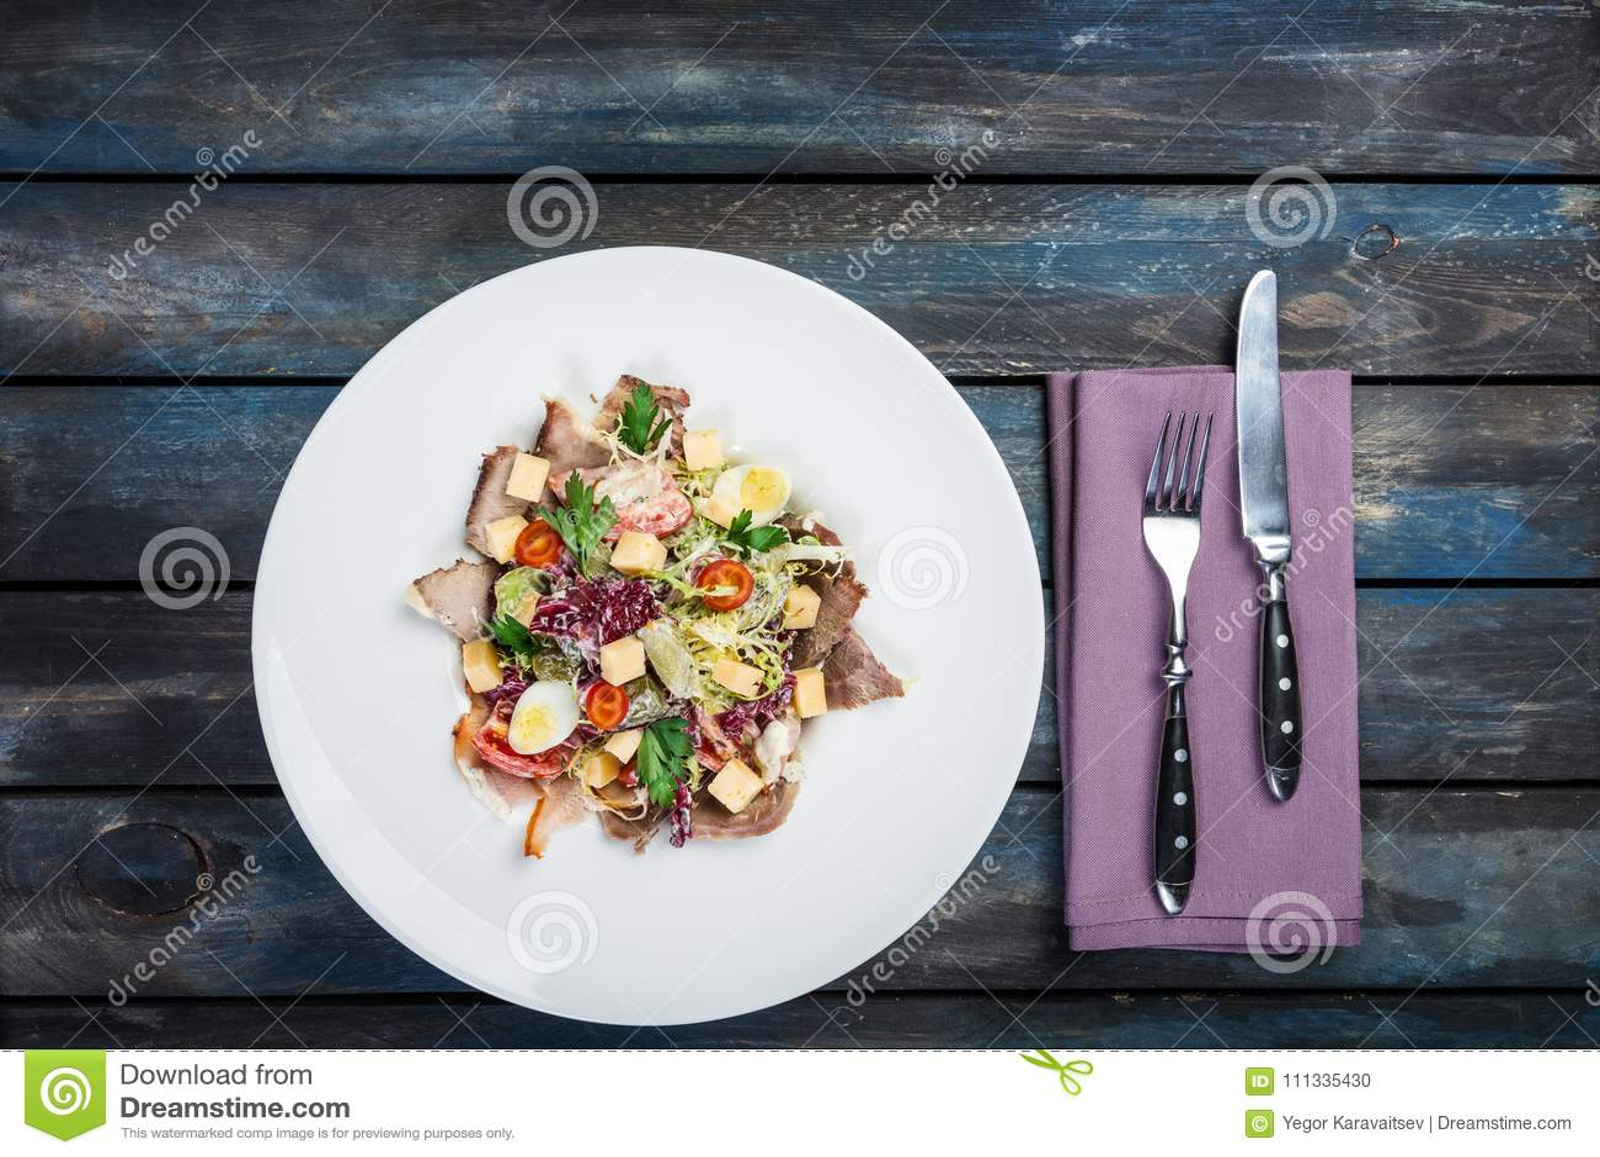 Salad. Mixed lettuce, tomatoes, turkey smoked, smoked duck, dried horsemeat